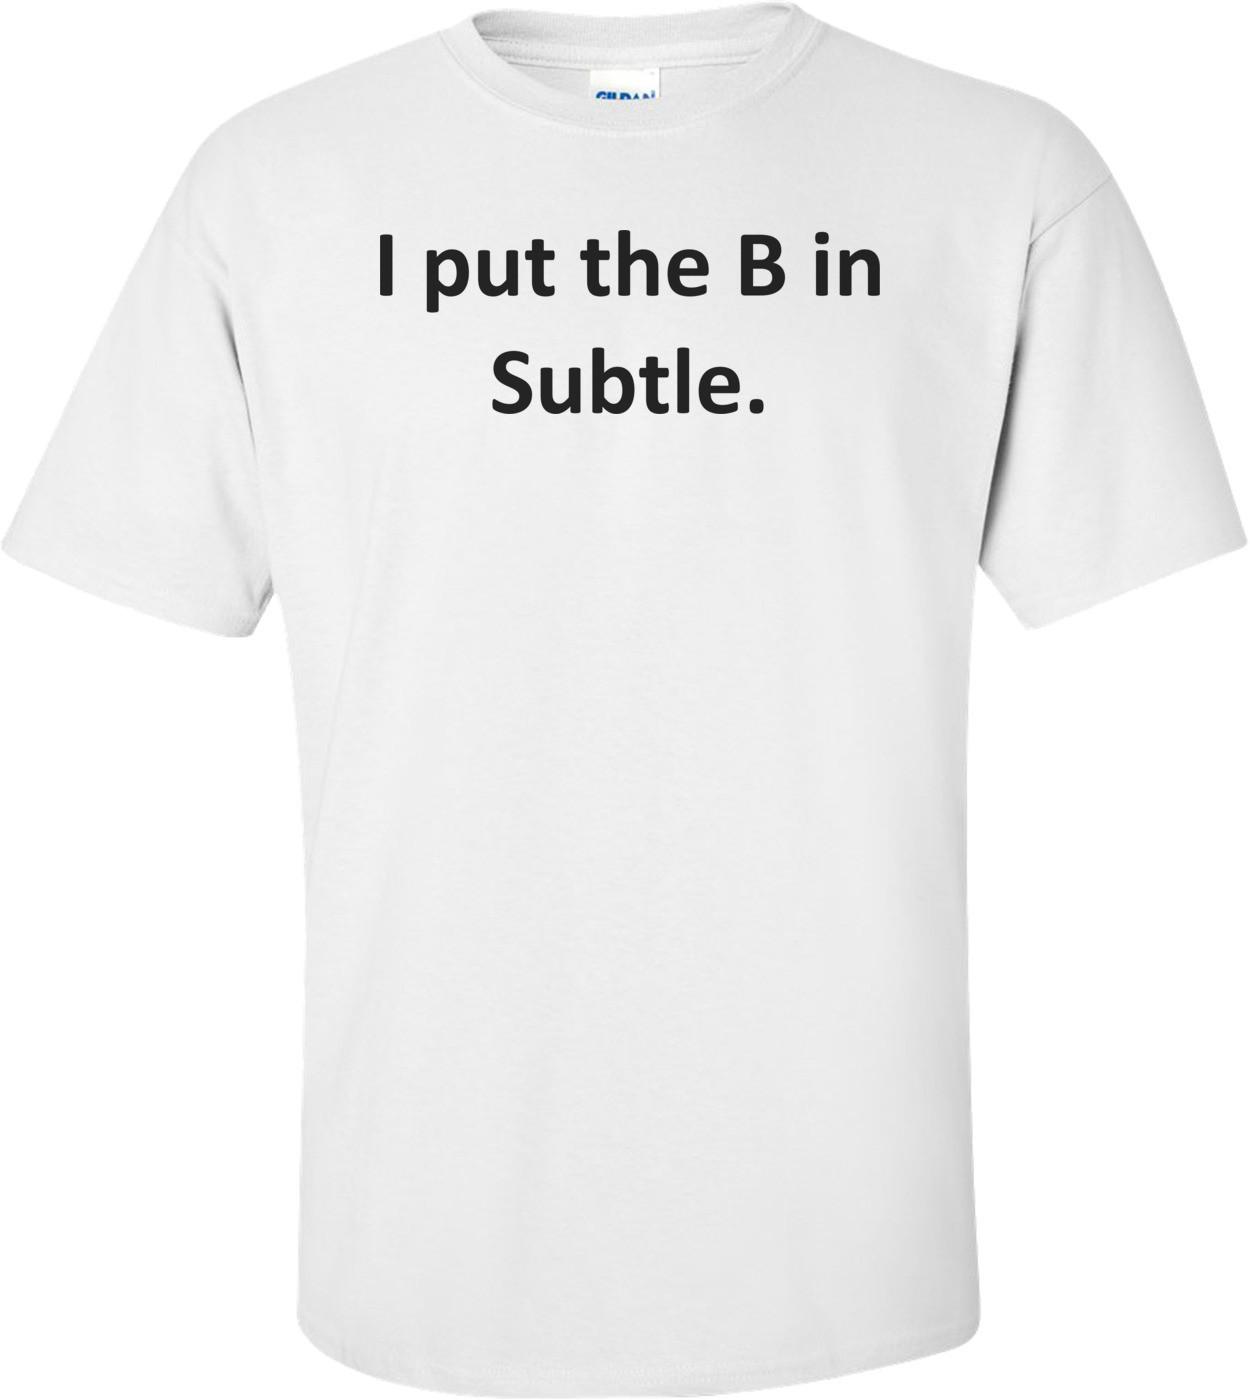 I put the B in Subtle. Shirt